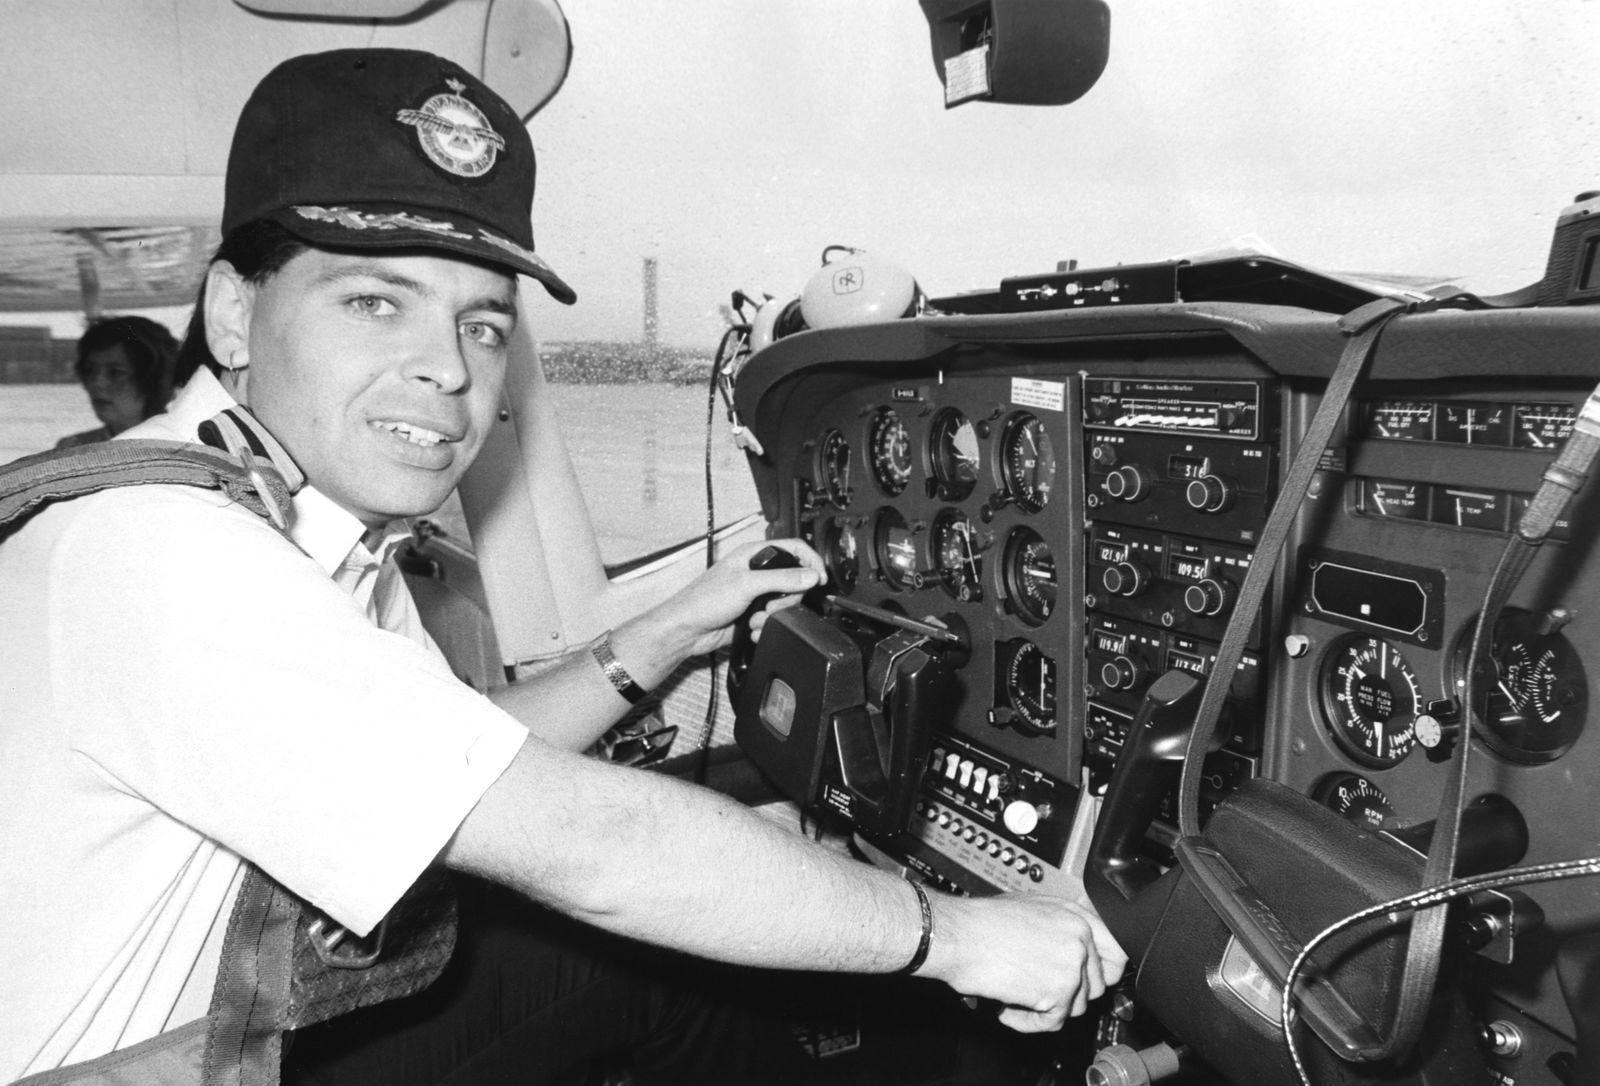 Gary Numan, Round-the-World Pilot